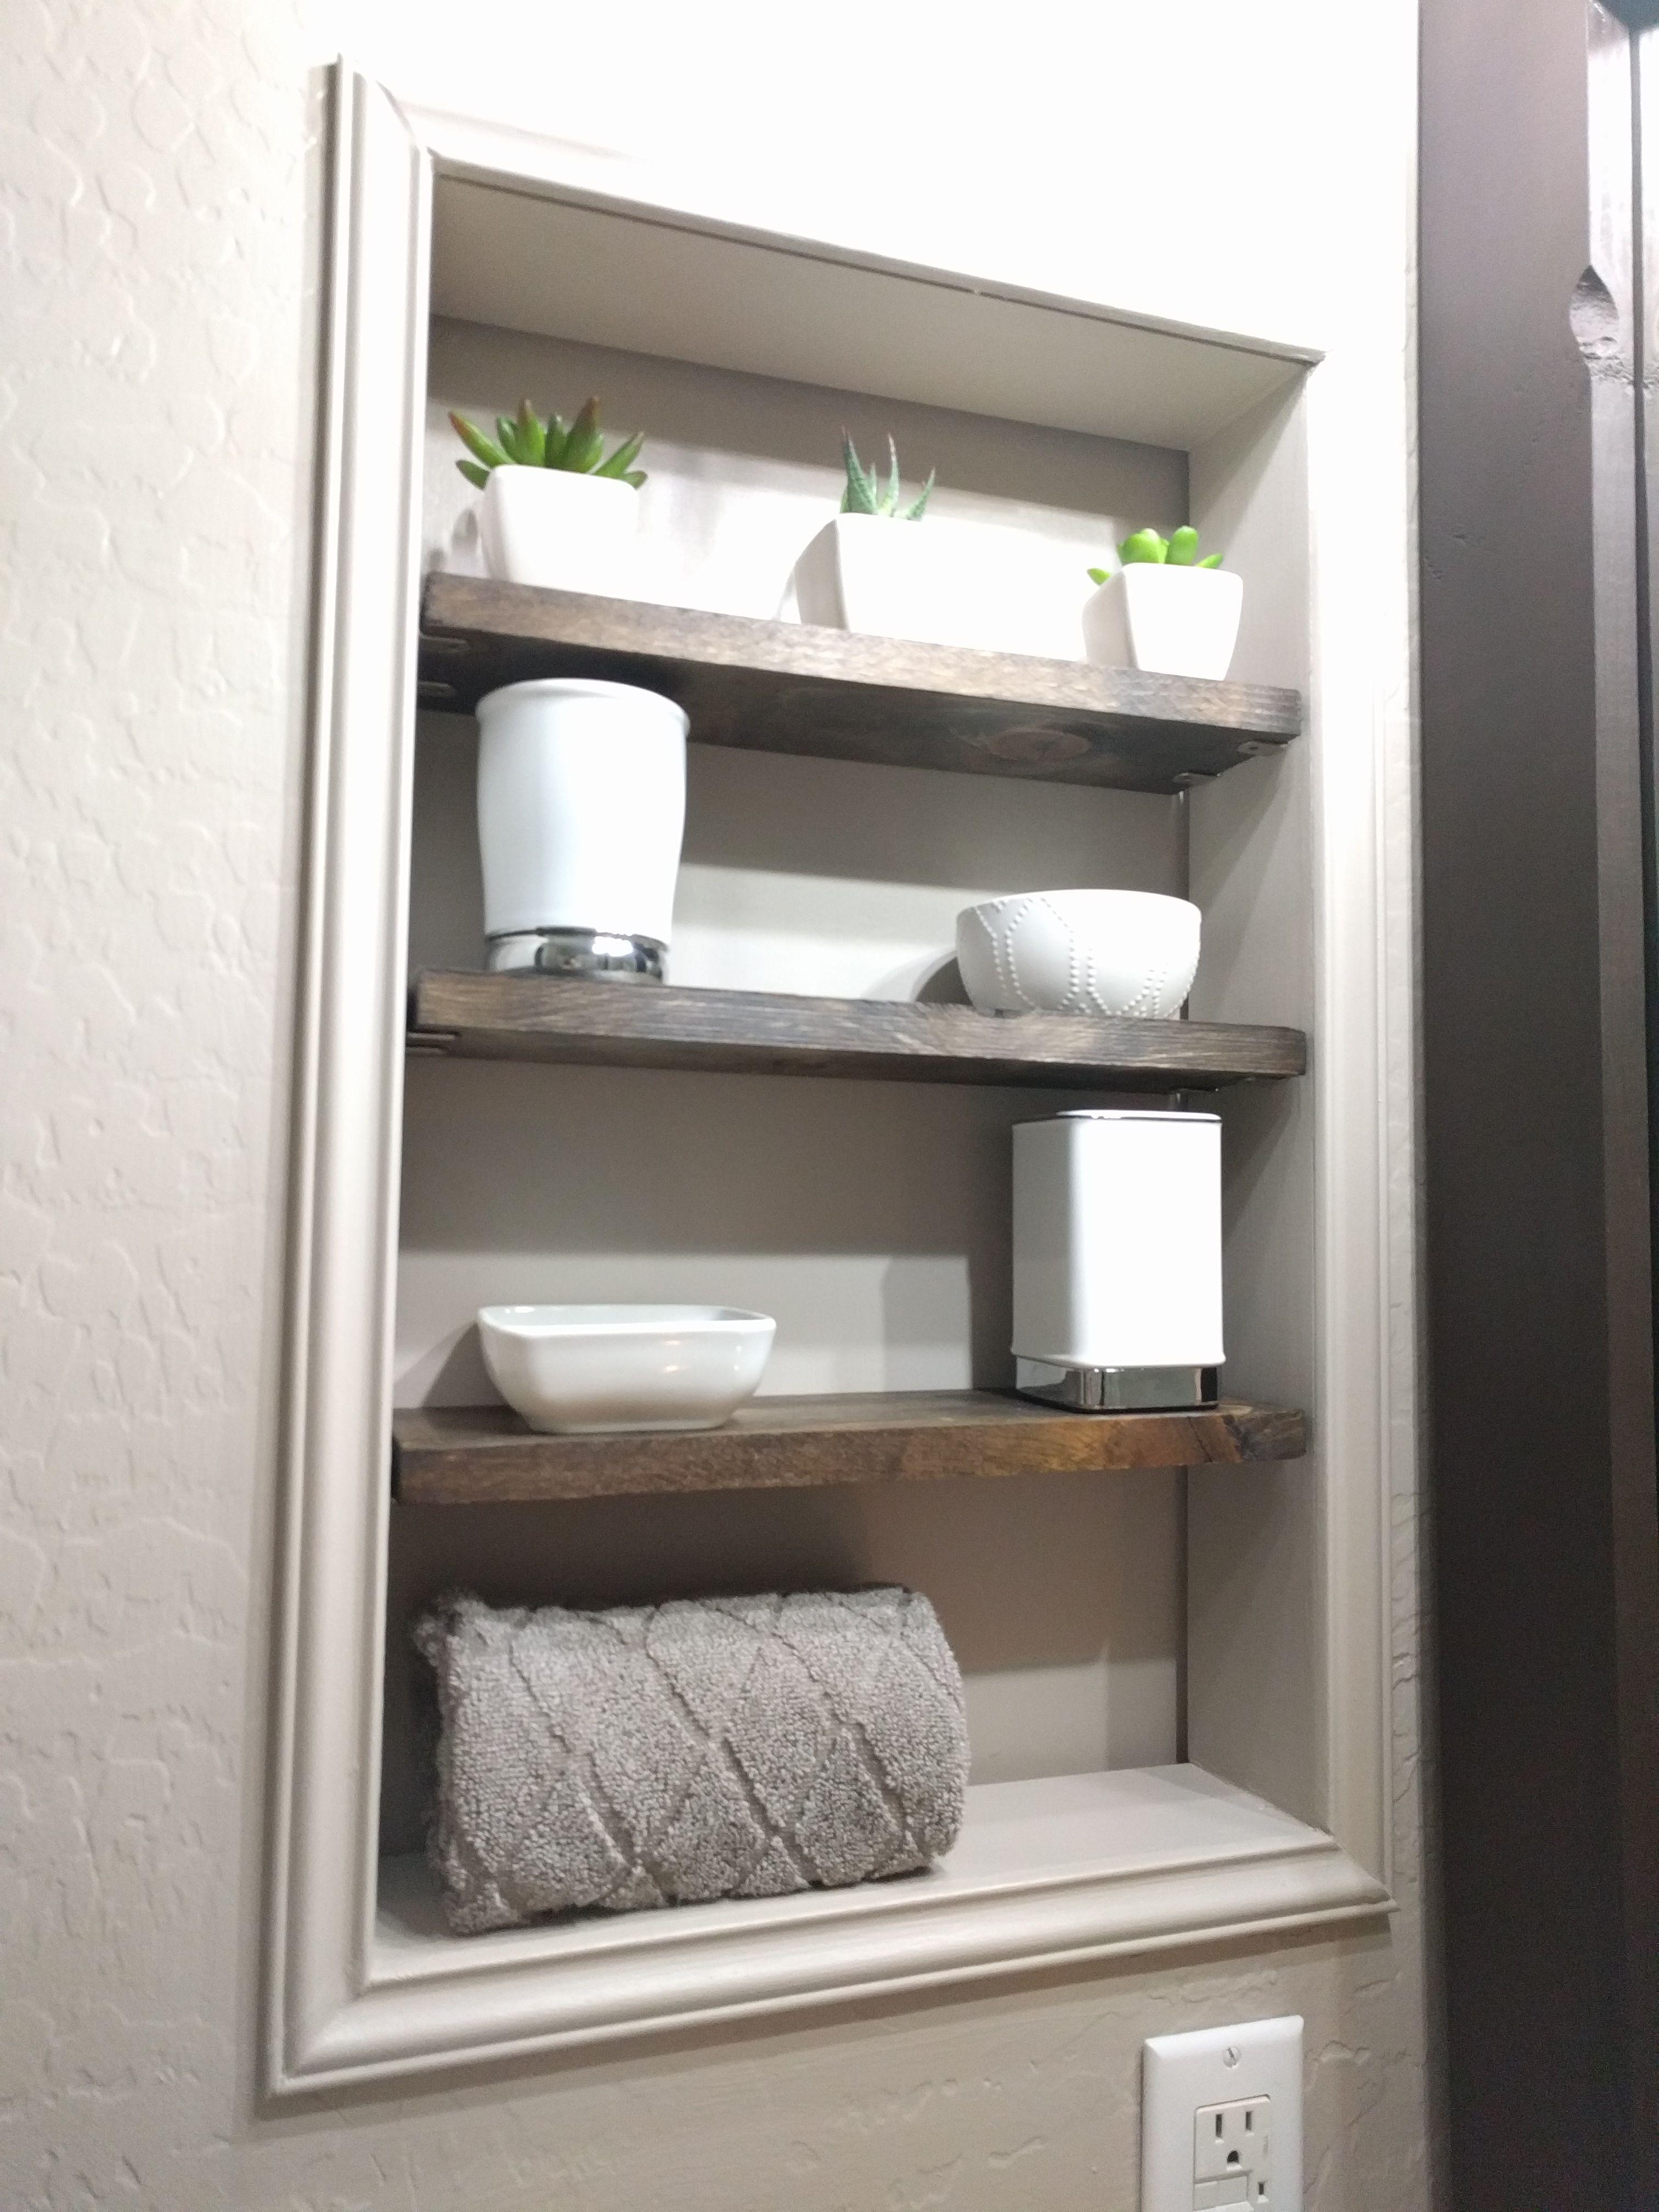 Recessed Shelves Bathroom, Recessed Bathroom Shelving